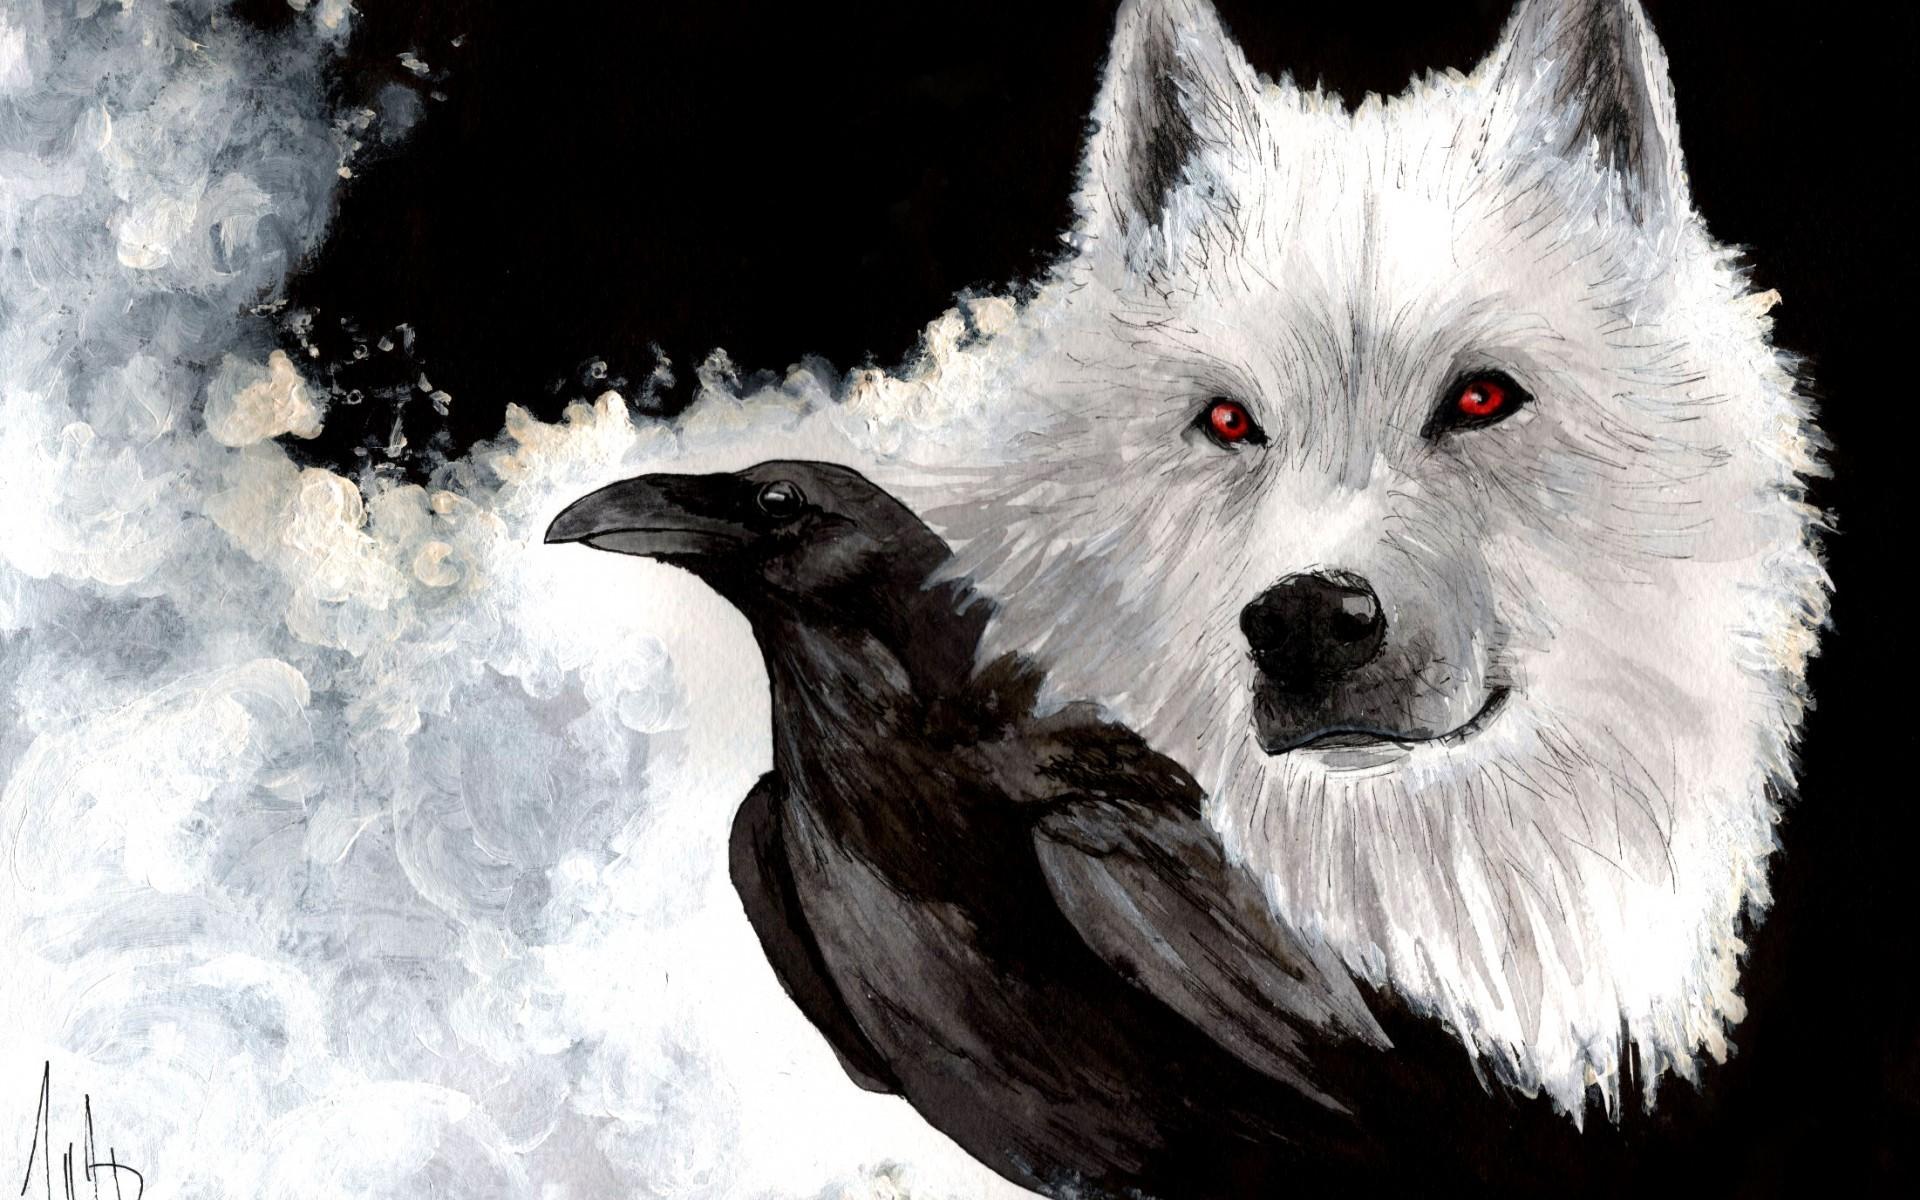 Wallpaper Birds Animals Monochrome Fantasy Art Wolf Black And White Dog Like Mammal 1920x1200 Madkads 200231 Hd Wallpapers Wallhere